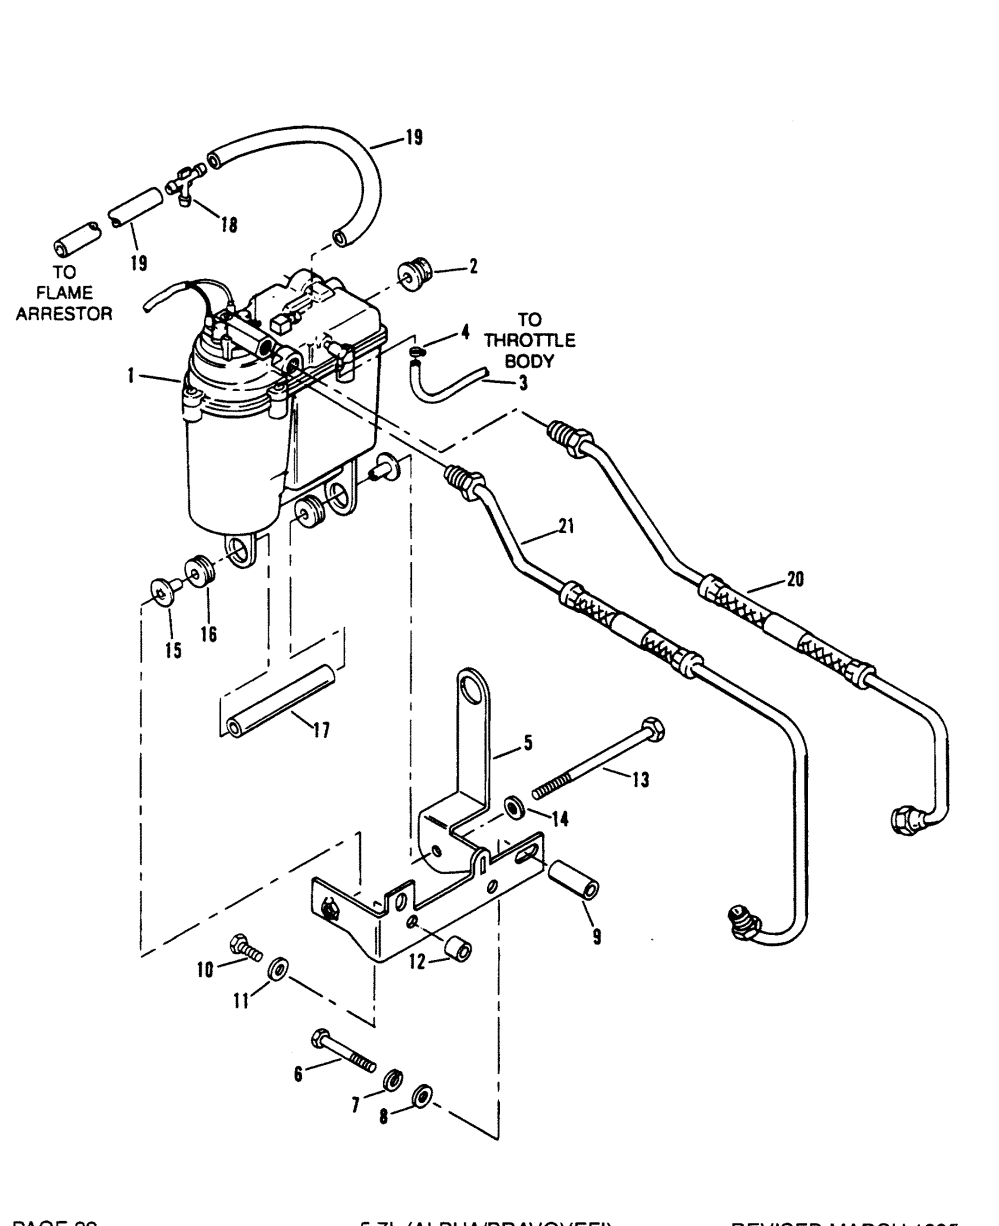 medium resolution of gm tbi efi wiring diagram wiring diagram g11 89 chevy truck tbi wiring harness schematic cp